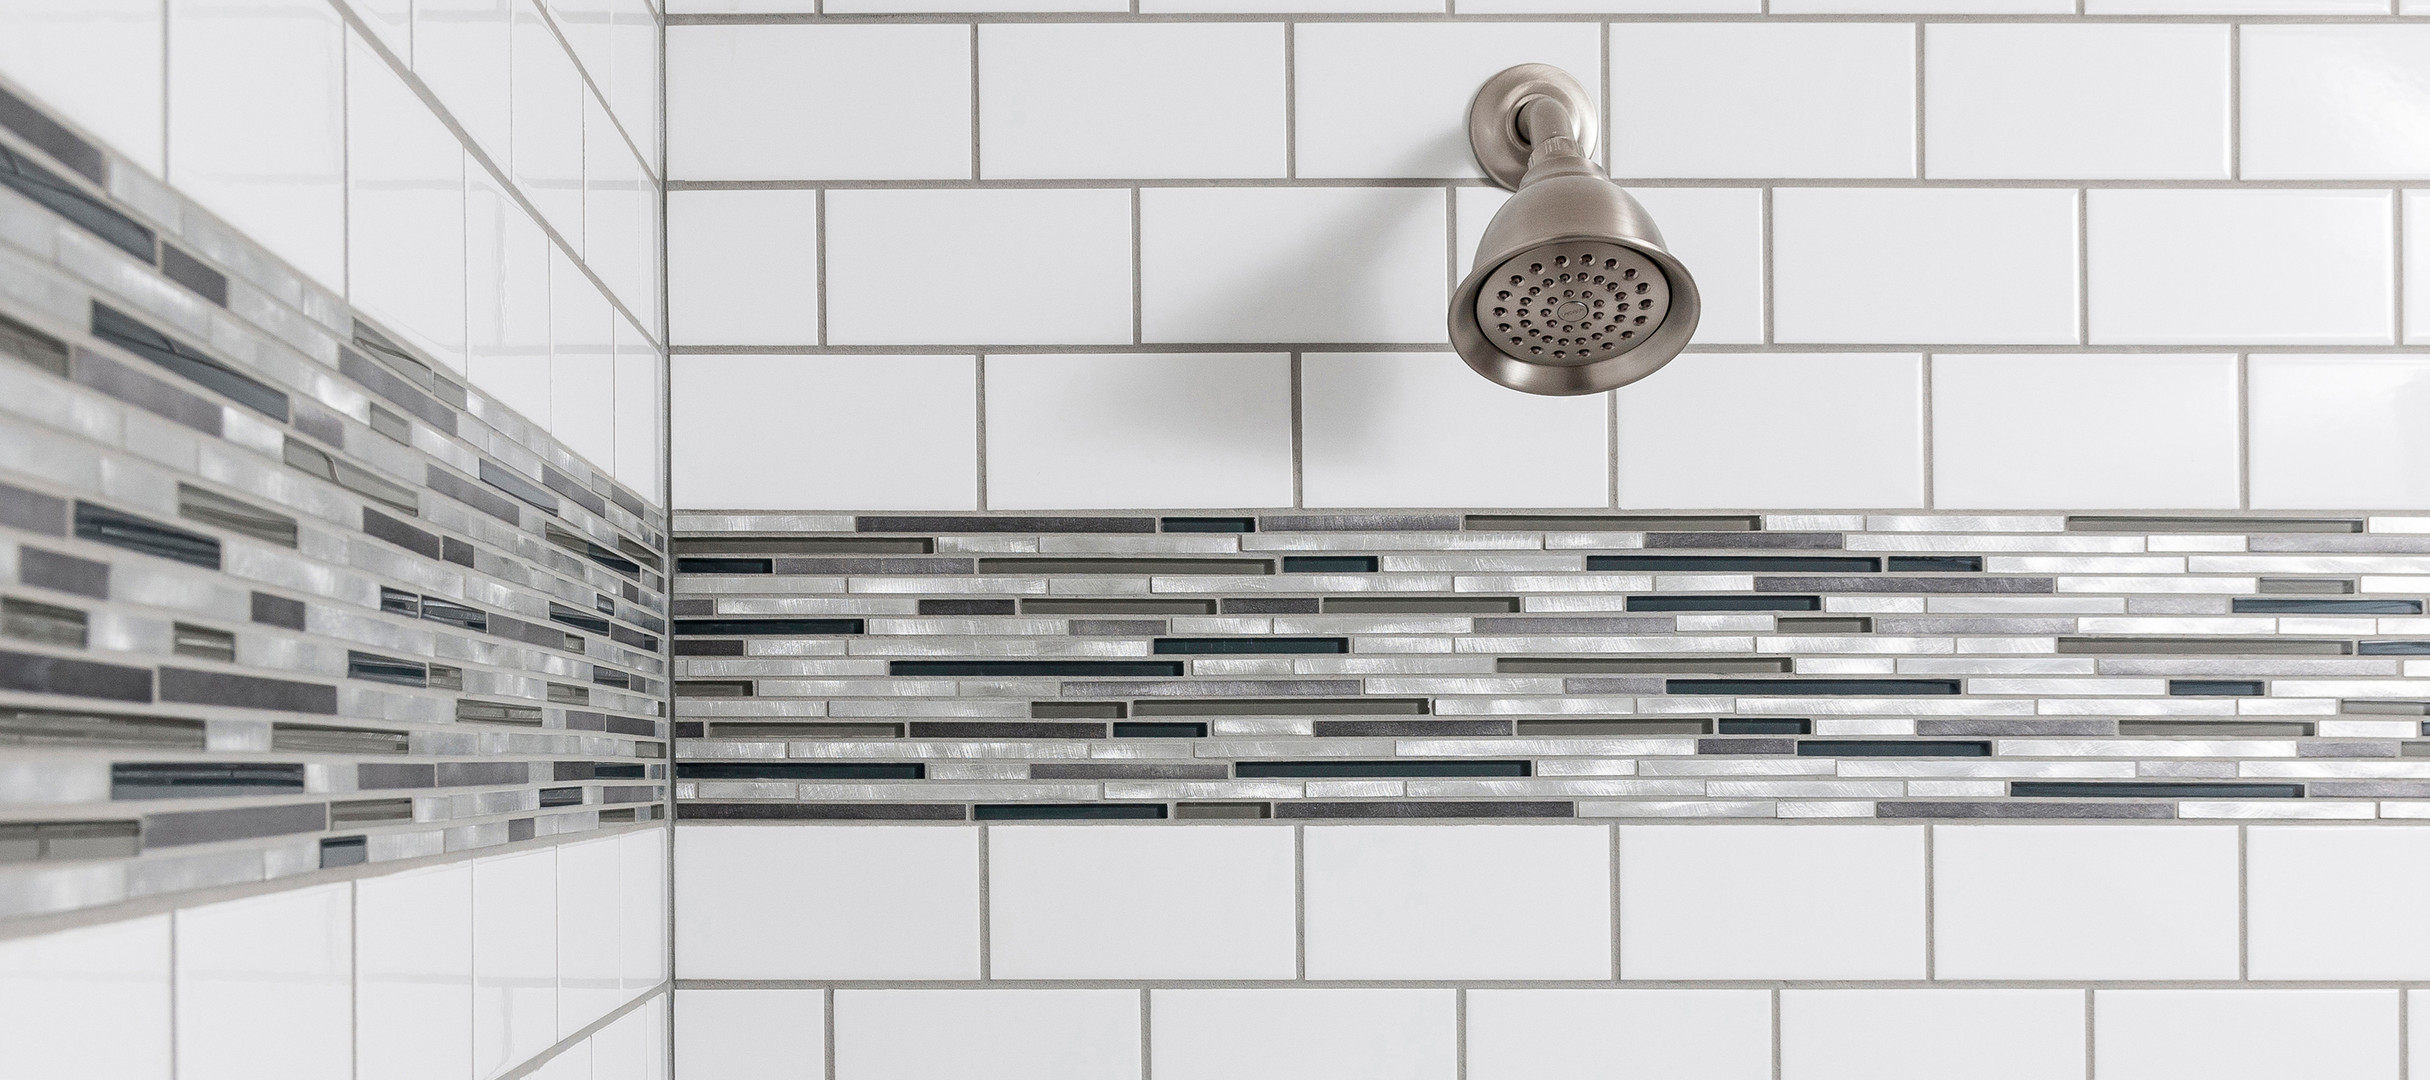 SouthPointe Construction . StudioWerks Custom    Field Tile: Ceramic White 3 x 6        Tile Pattern: 1/2 Offset        Accent Liner: Platinum        Grout: Warm Grey        Tile Pan: Architectural Grey        Tile Pan Grout: Warm Grey  